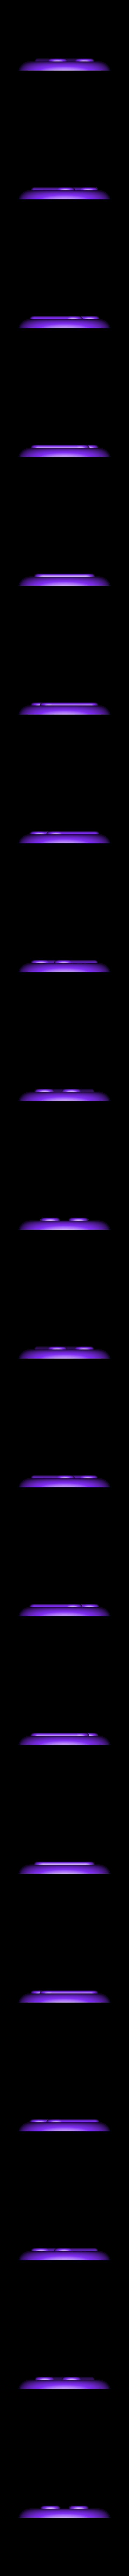 SeeUPauseButtonAscii.stl Download STL file SeeU Buttons • 3D printable template, Laramaine